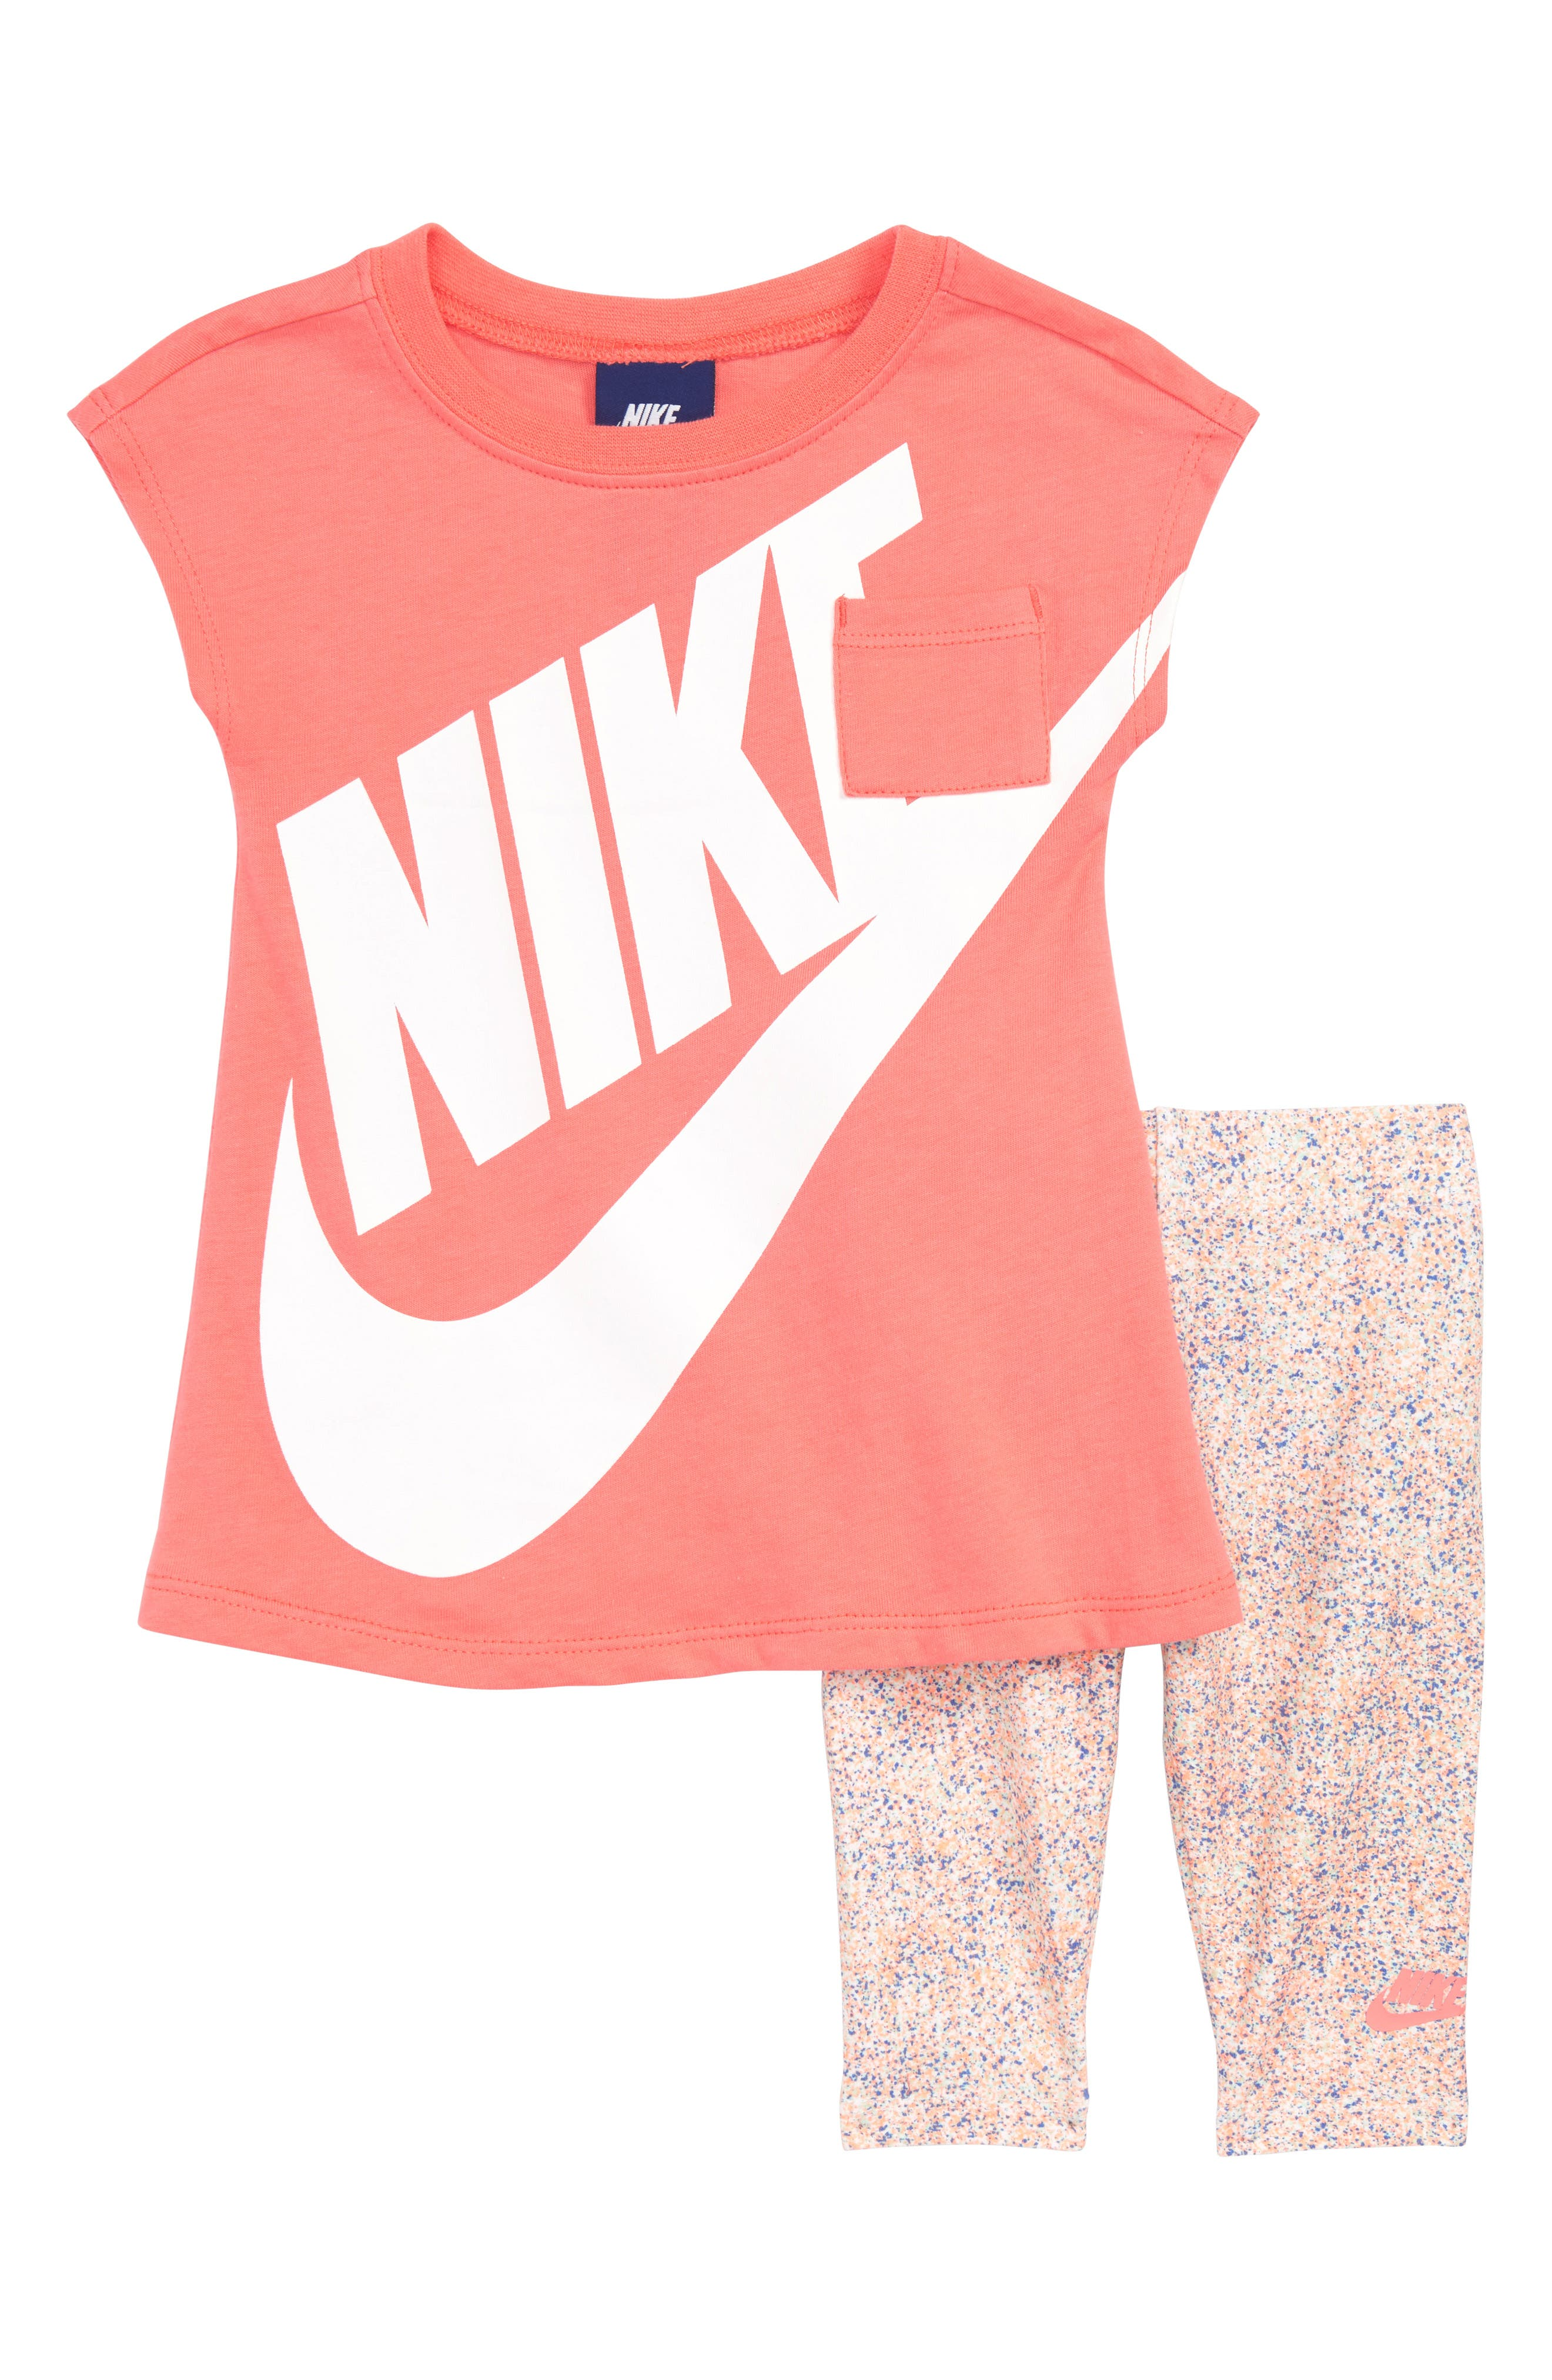 Futura Dress & Capri Leggings Set,                             Main thumbnail 1, color,                             100